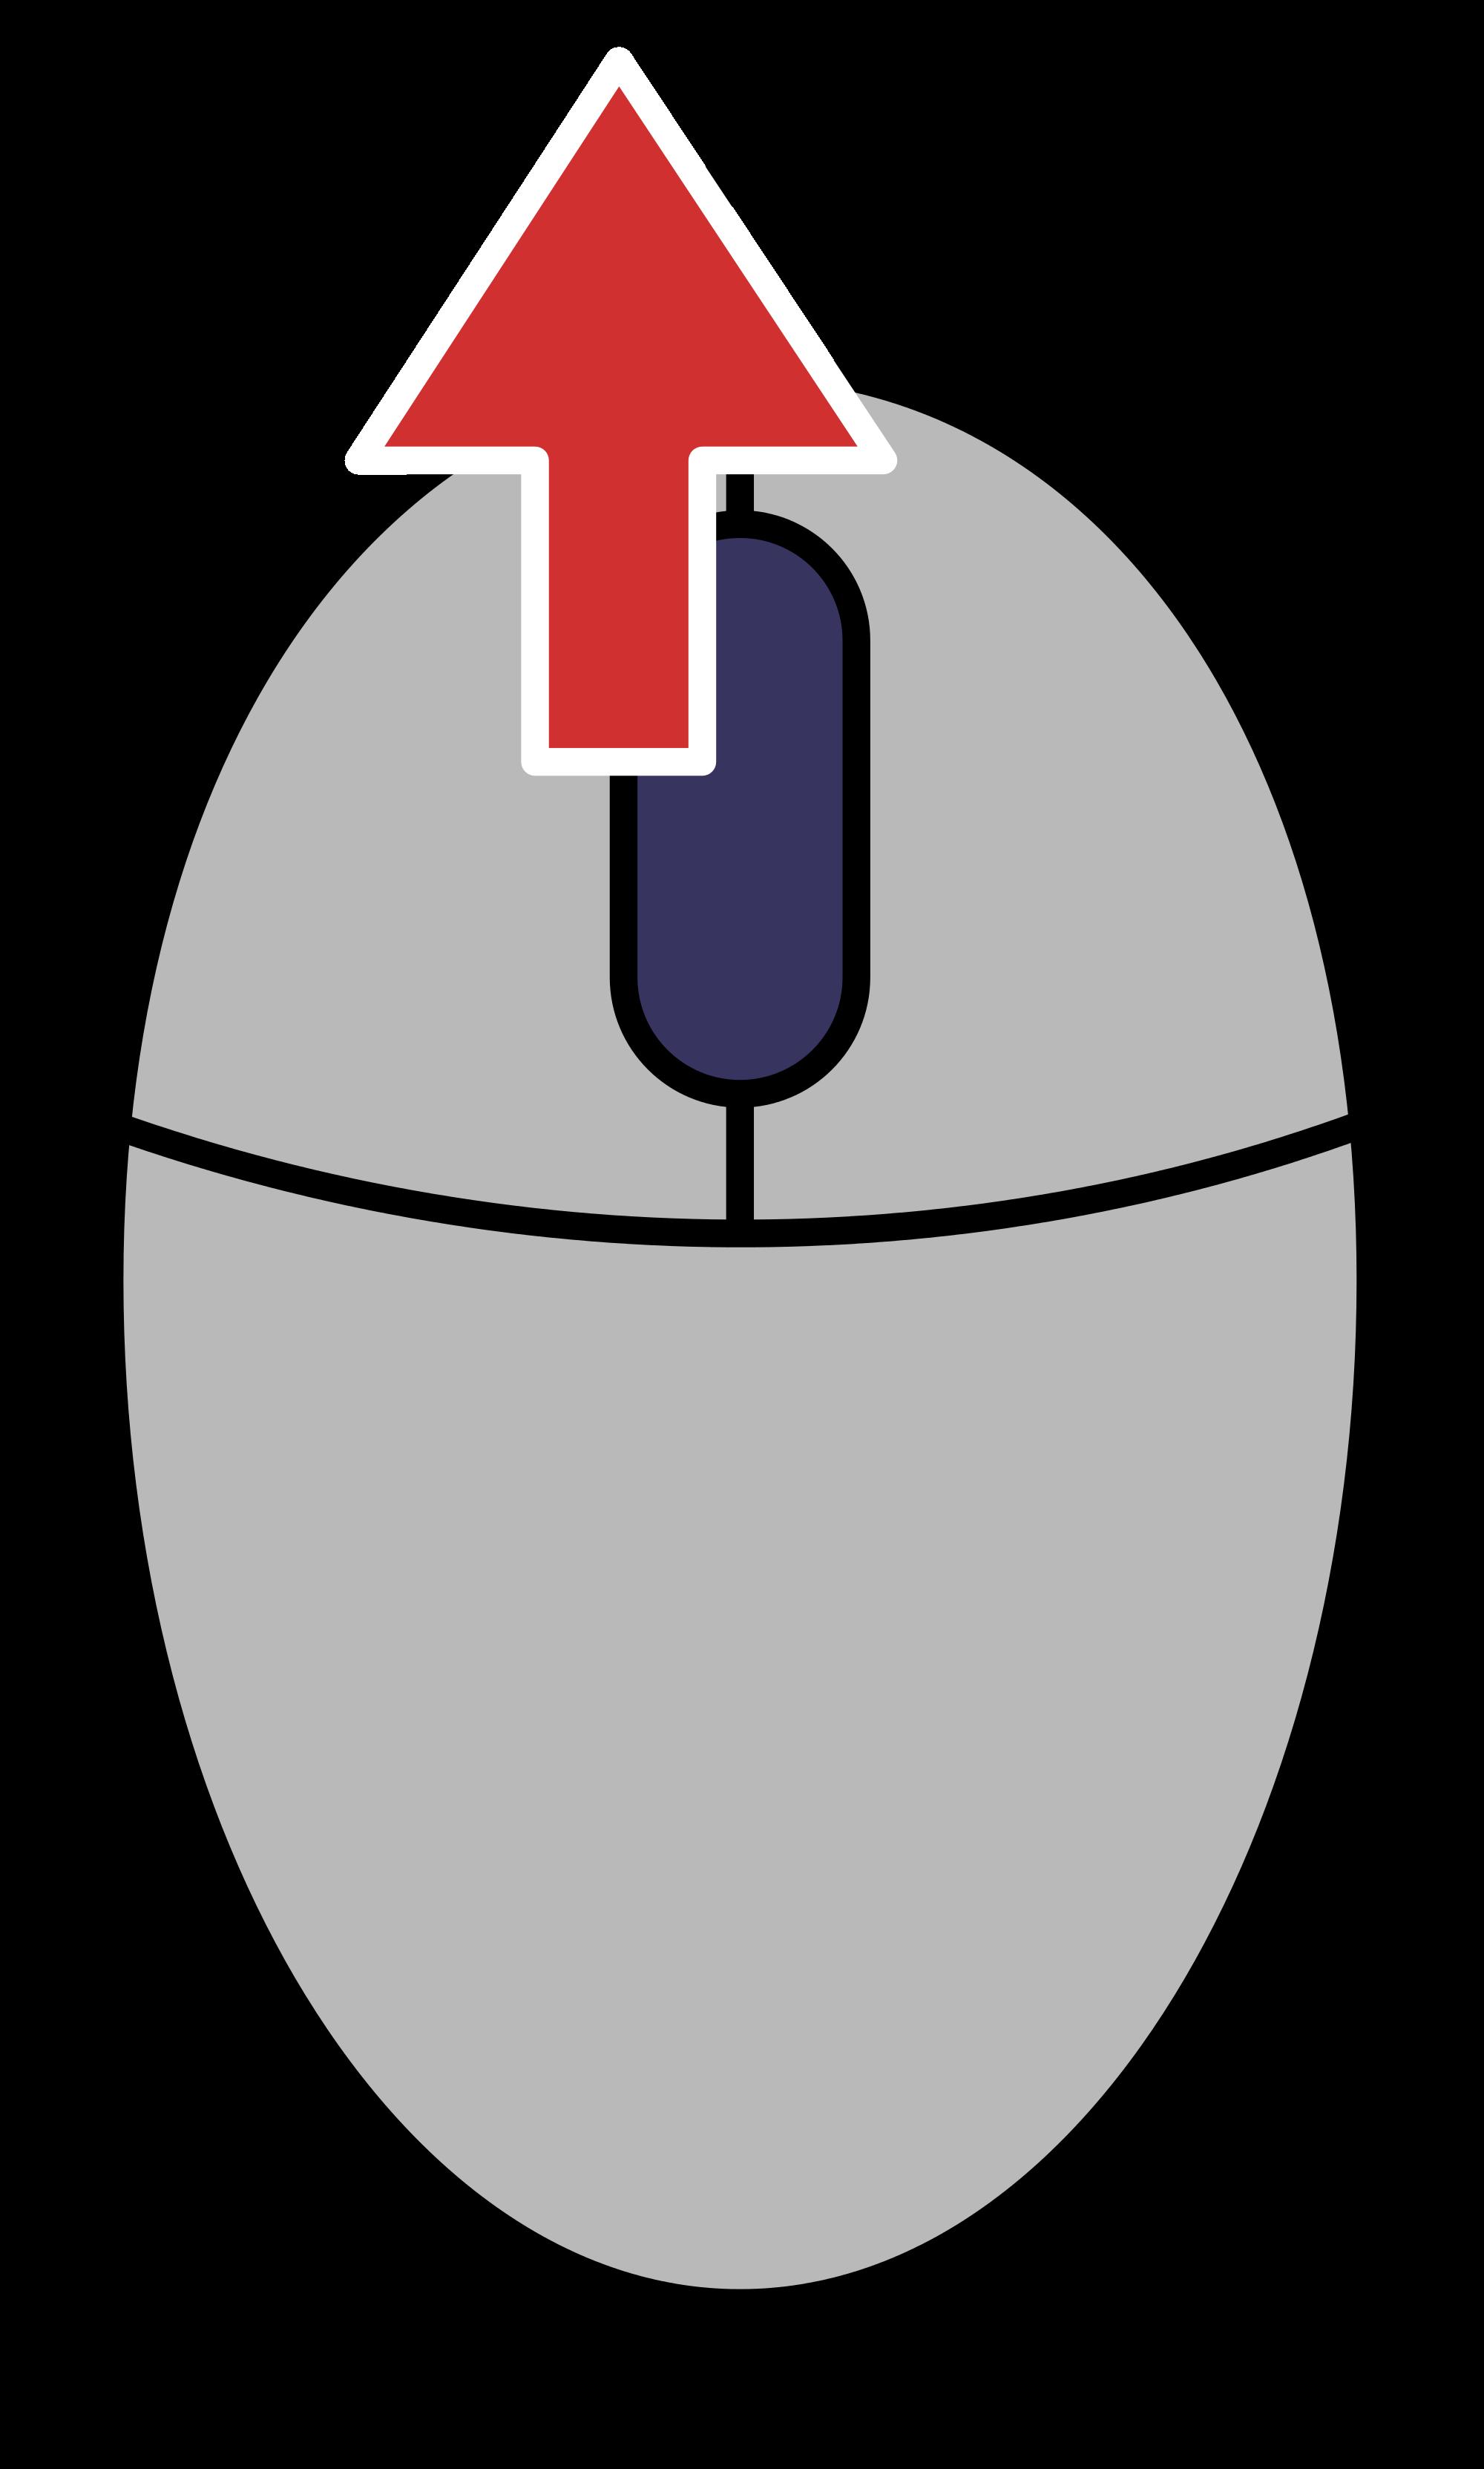 File:Mouse wheel up.svg.